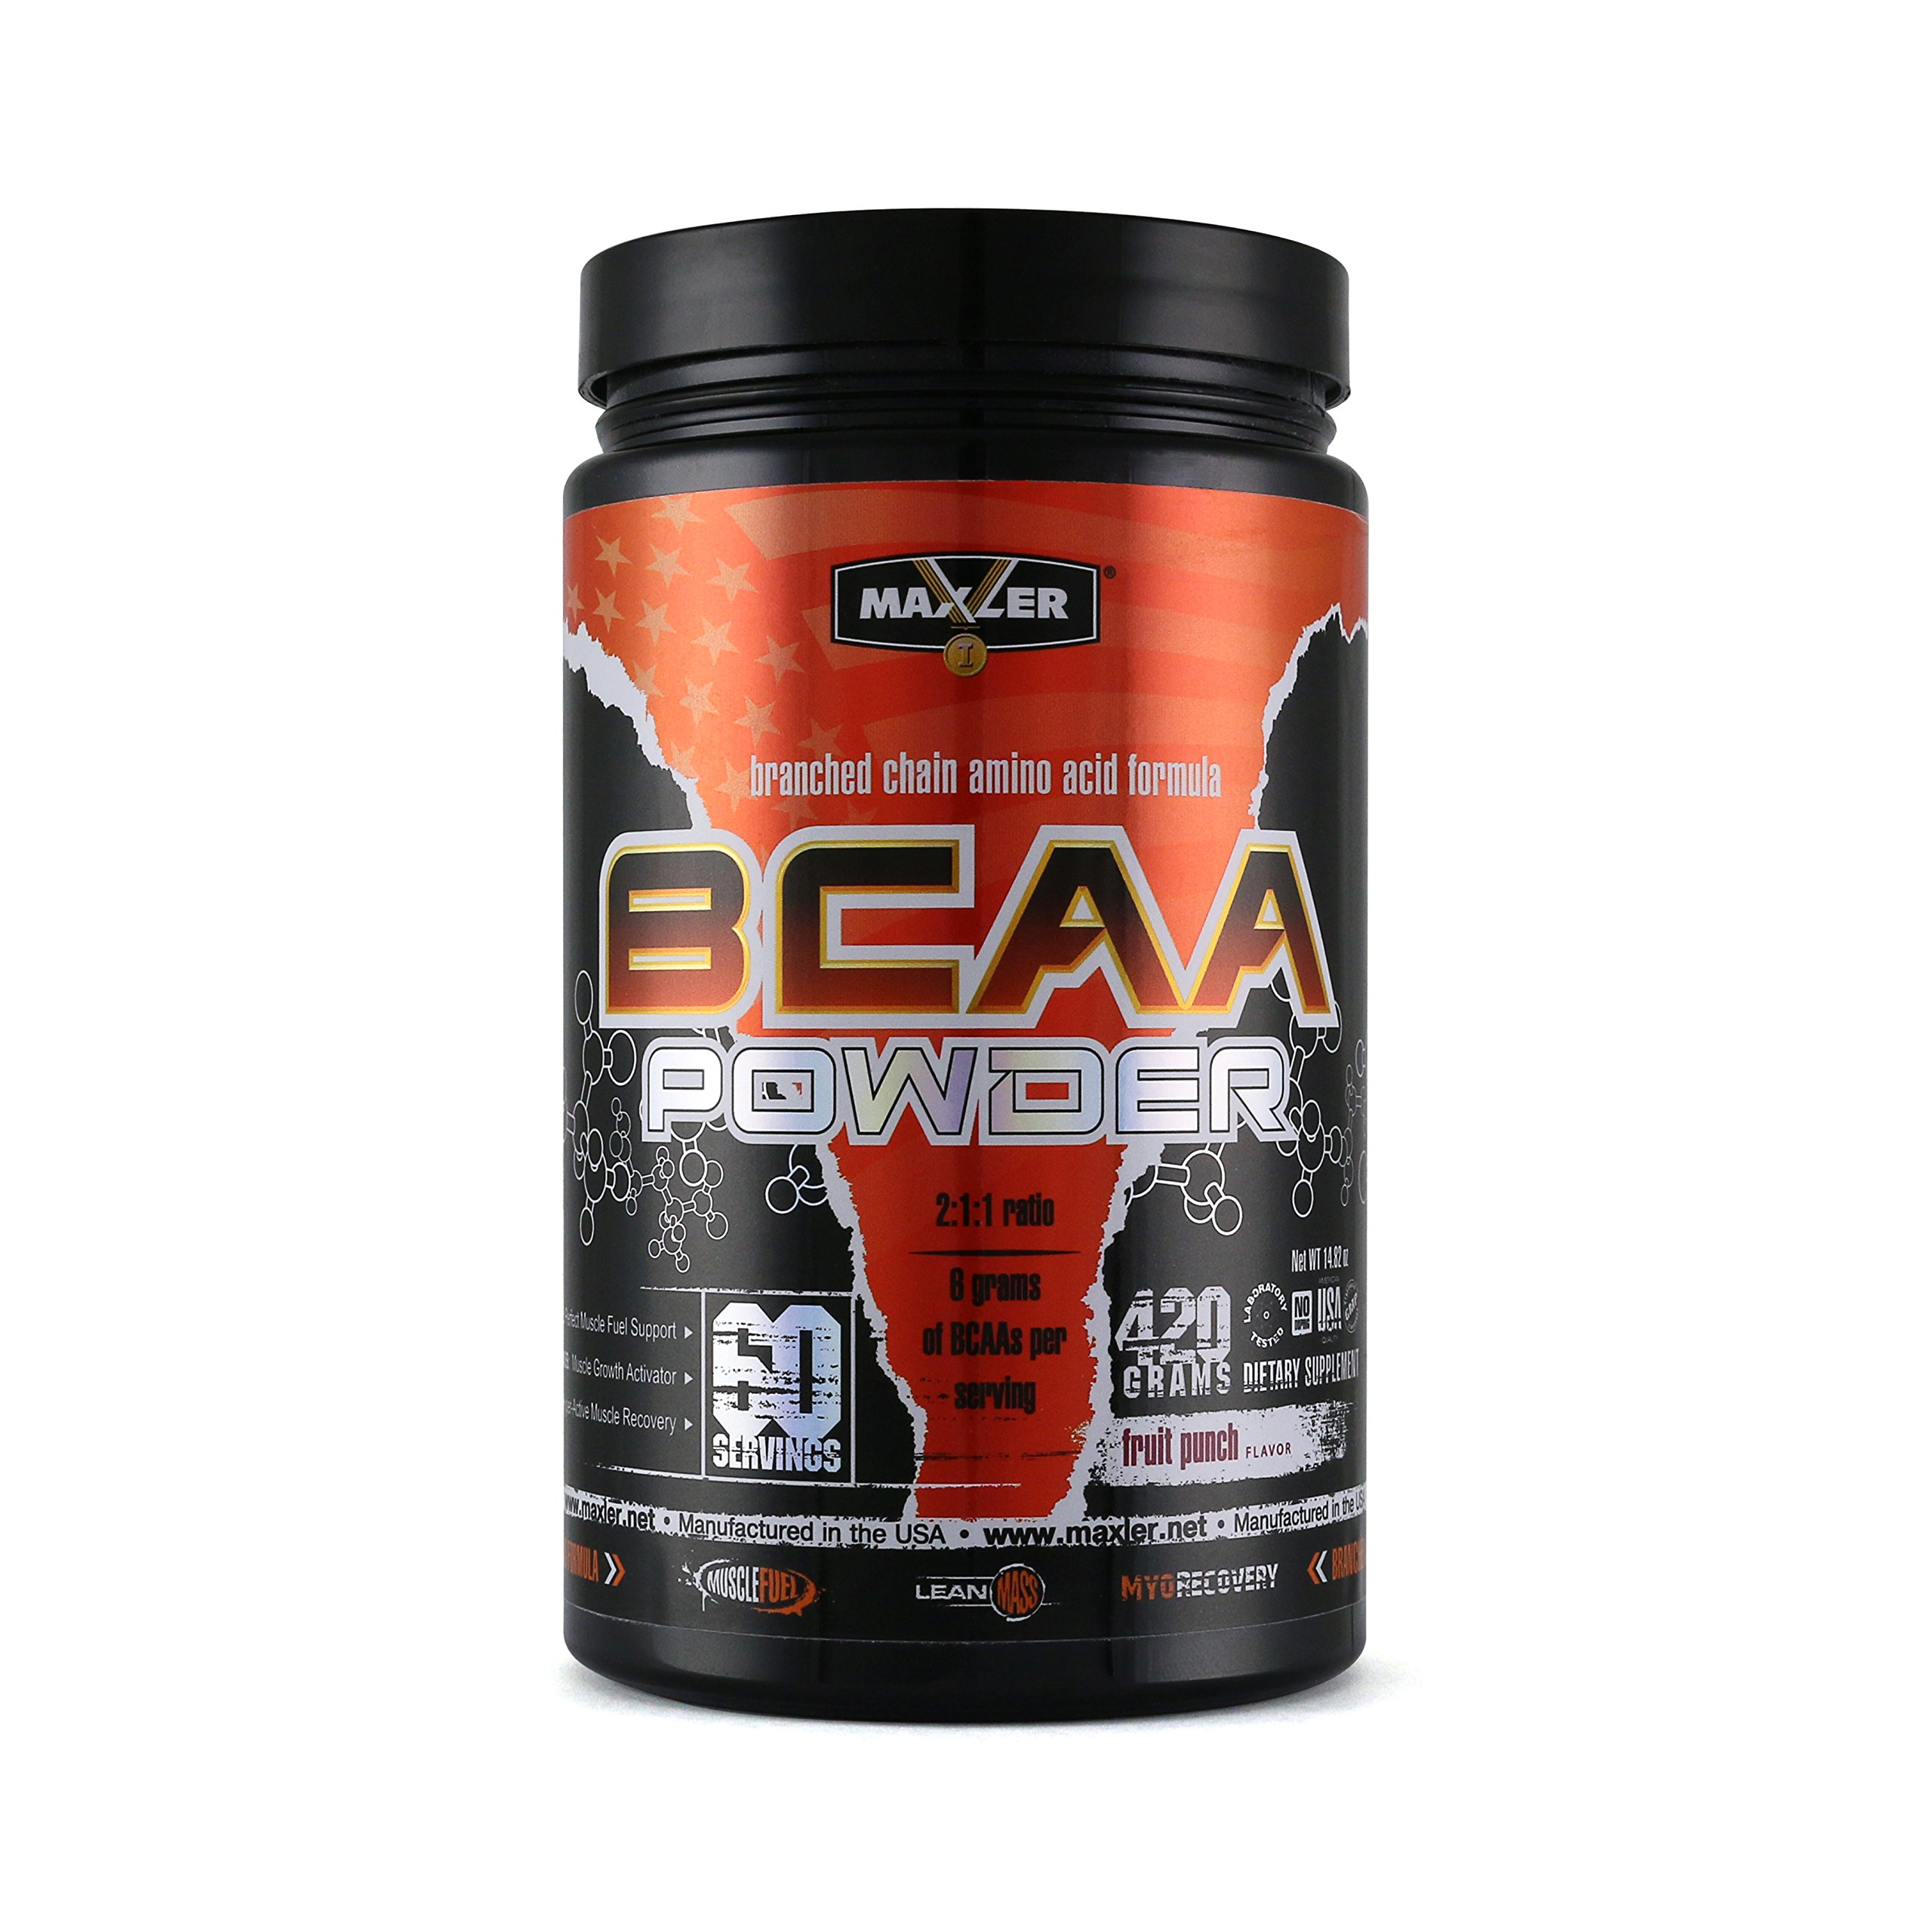 MAXLER BCAA Powder, Fruit Punch, 60 Servings